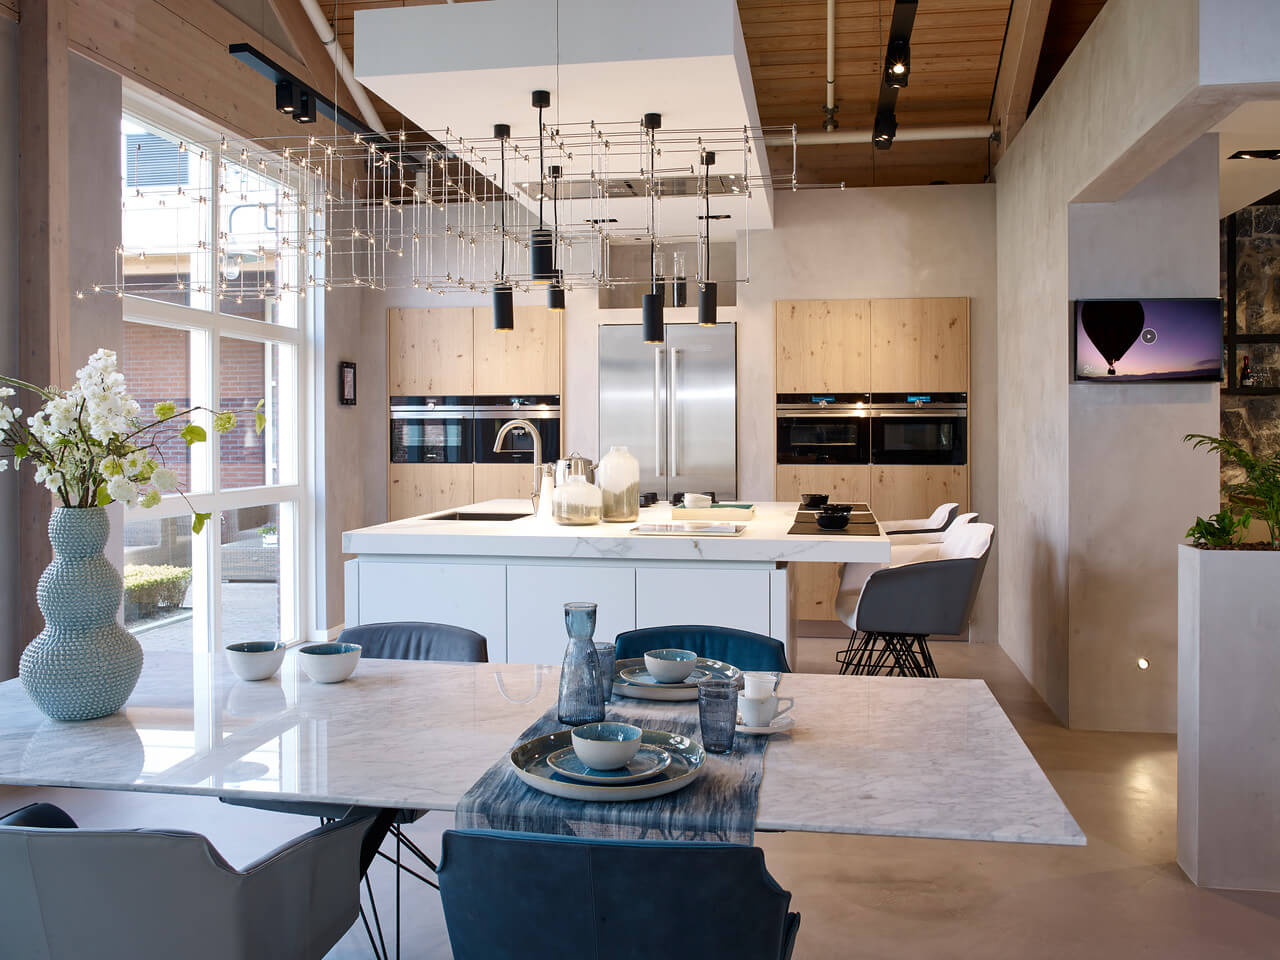 Exclusieve keukens van Tieleman Keukens